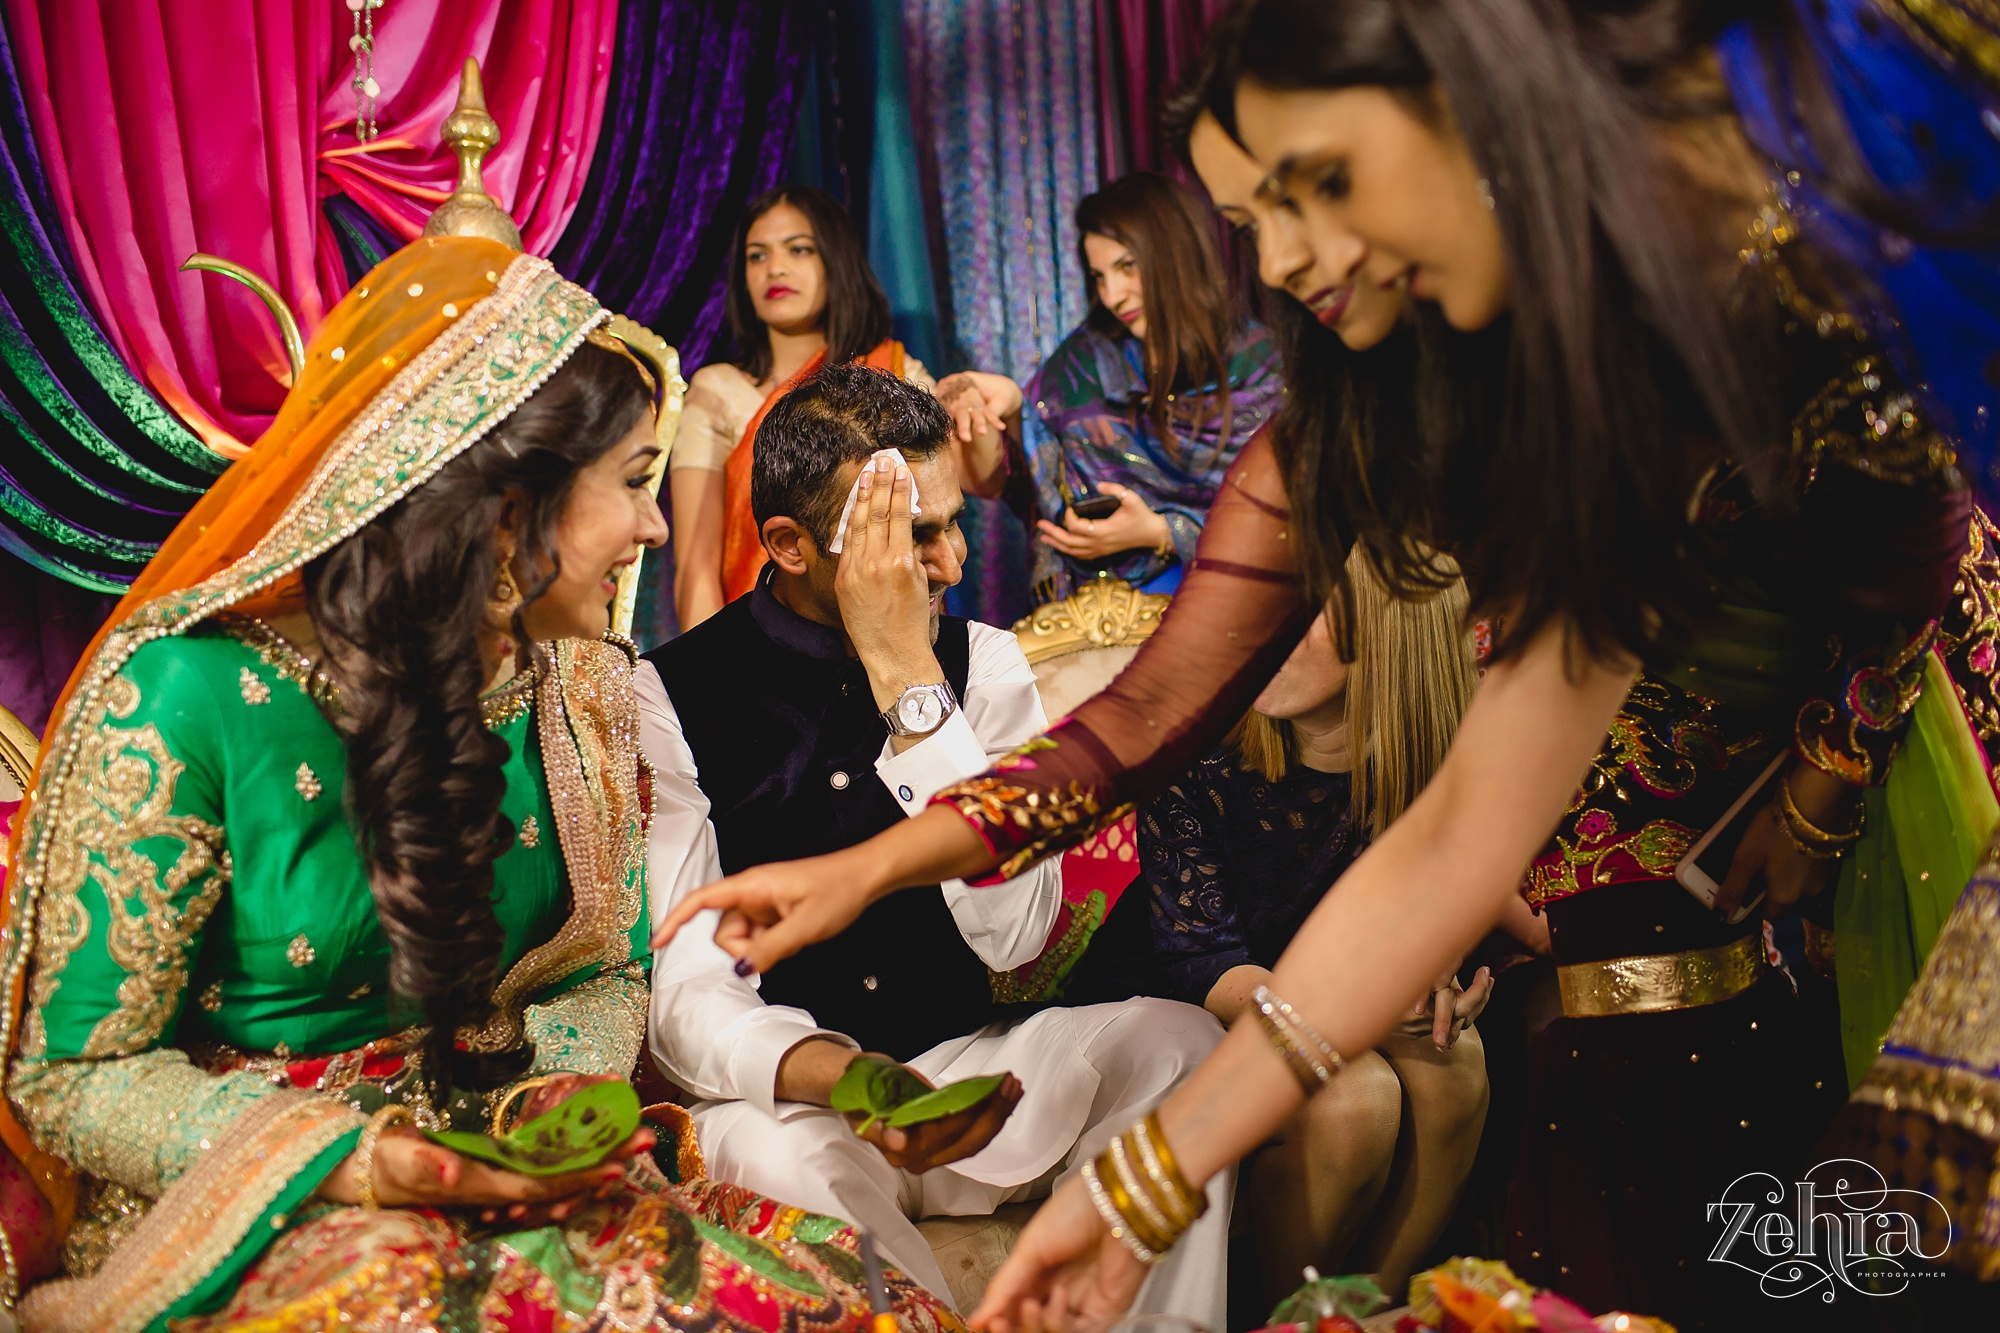 zehra wedding photographer arley hall cheshire034.jpg